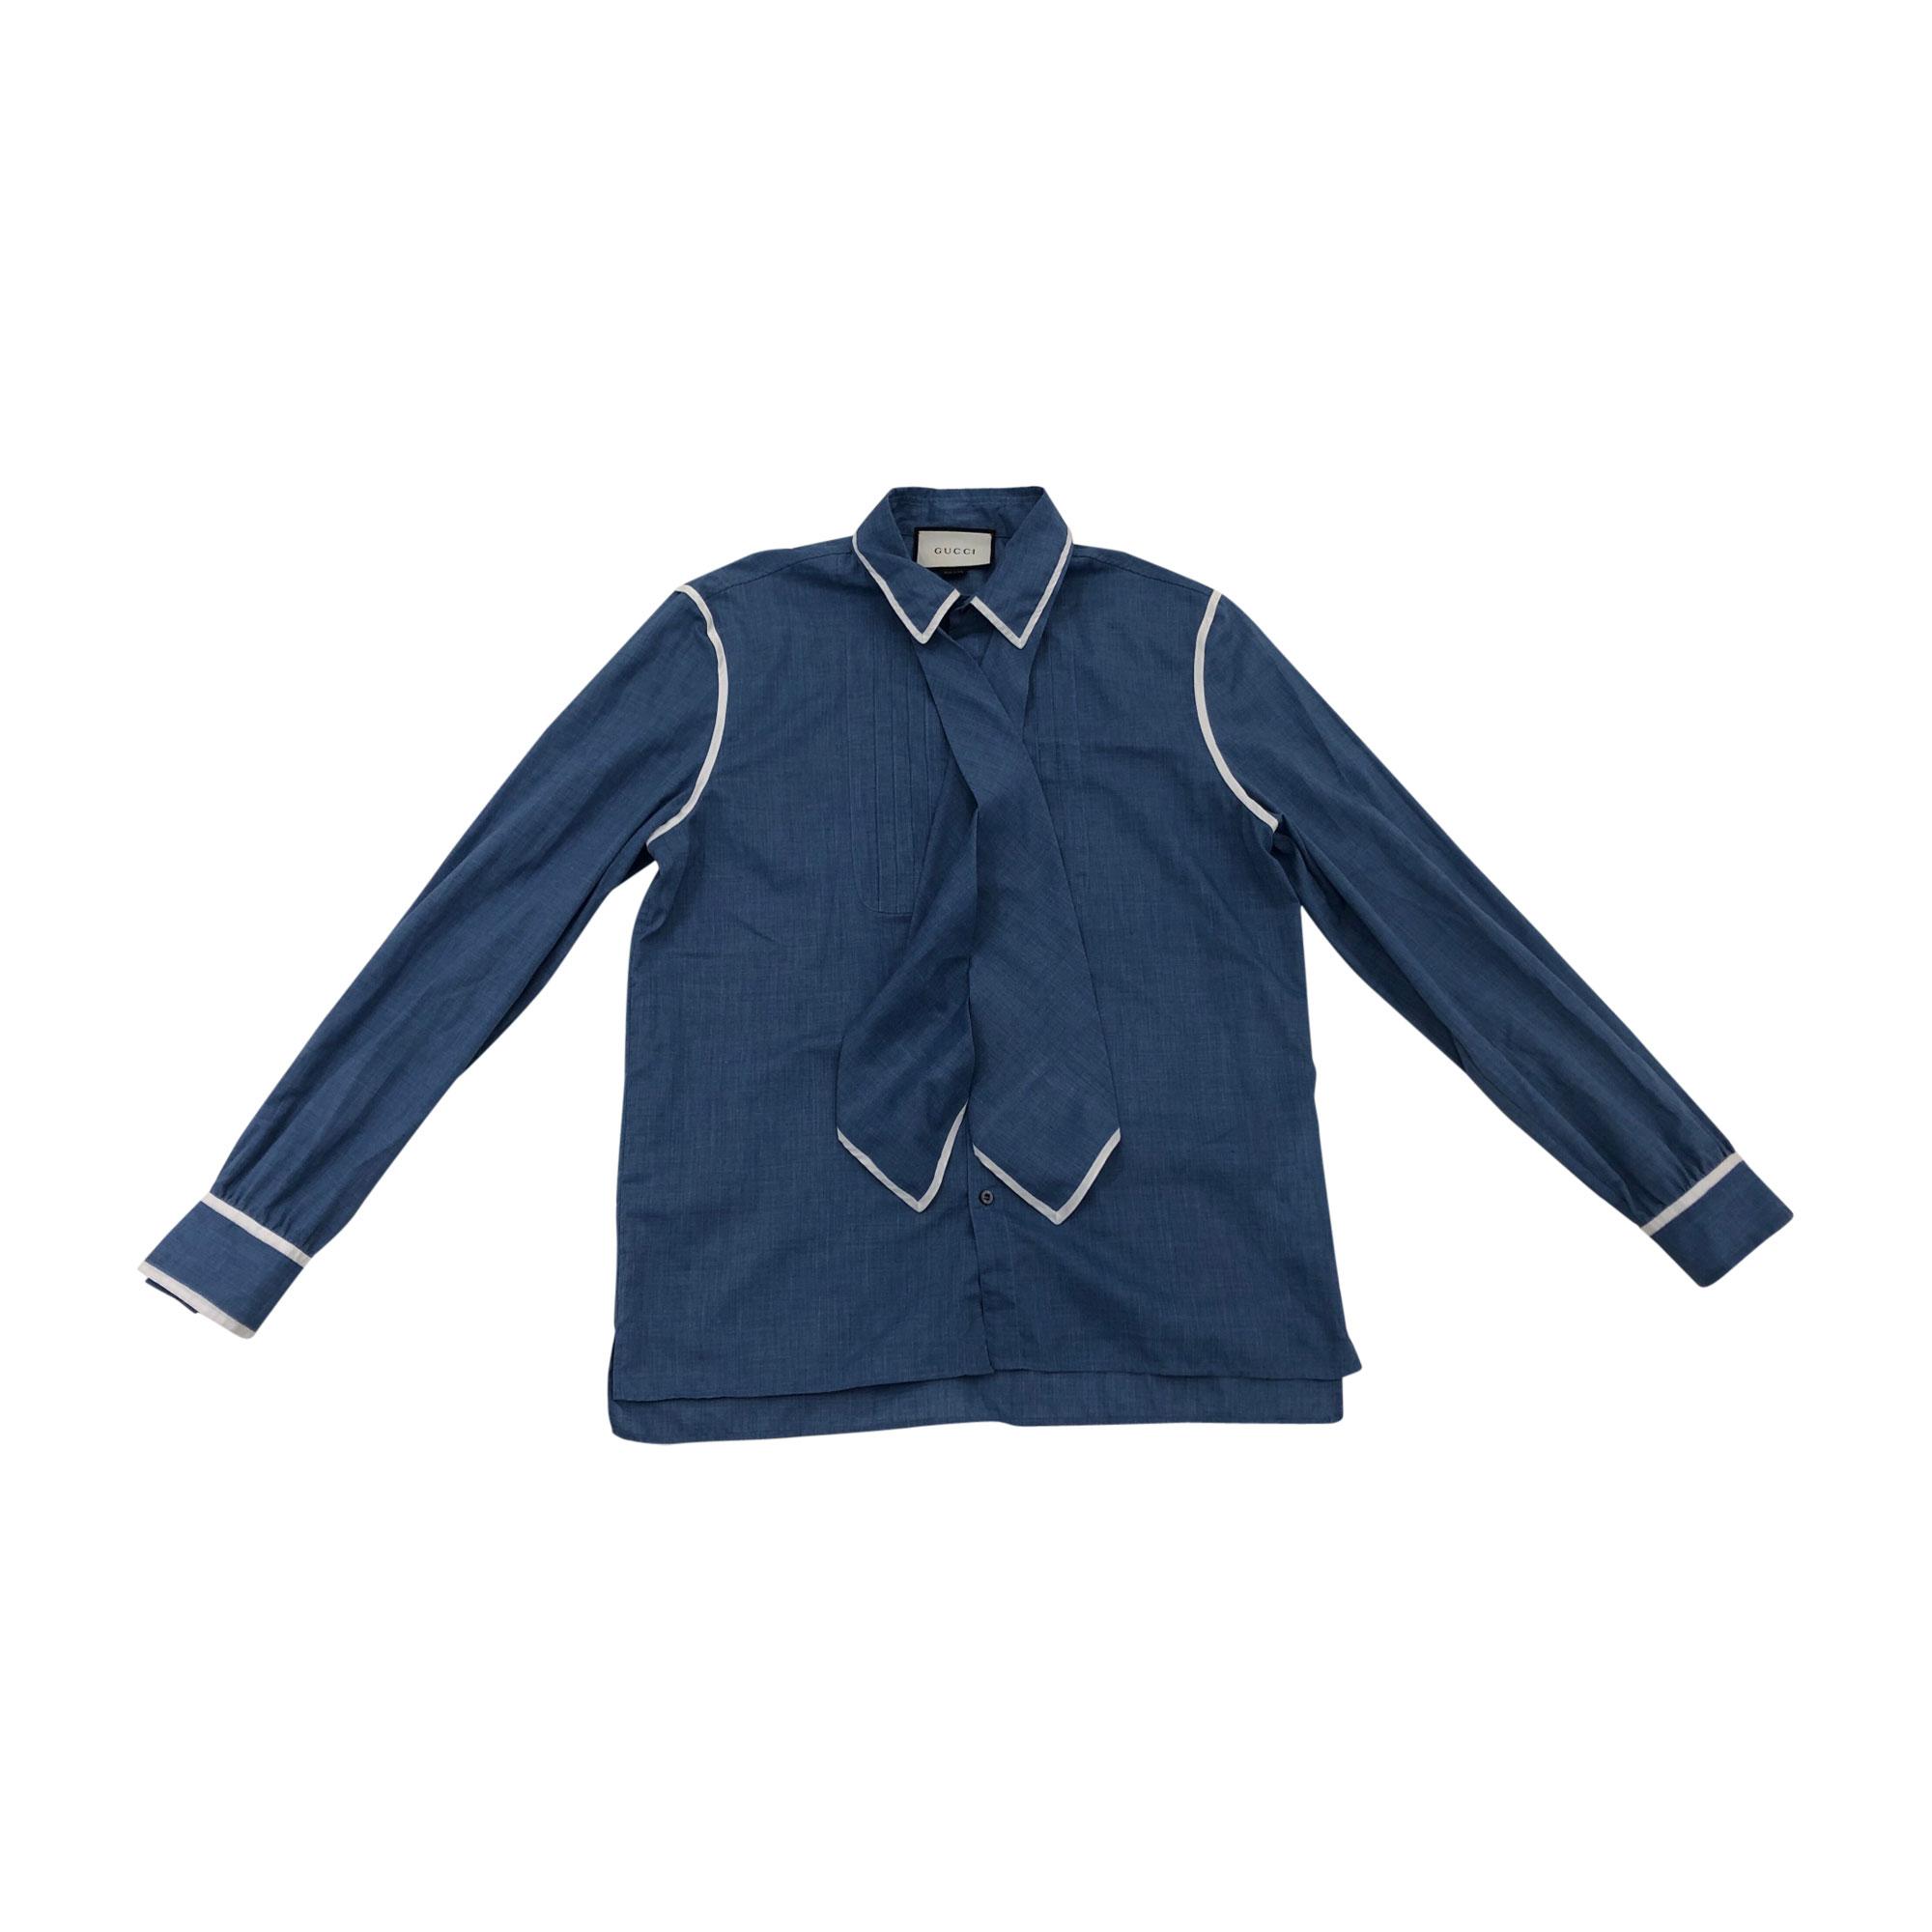 d6c187bfec09 Chemise GUCCI Bleu, bleu marine, bleu turquoise